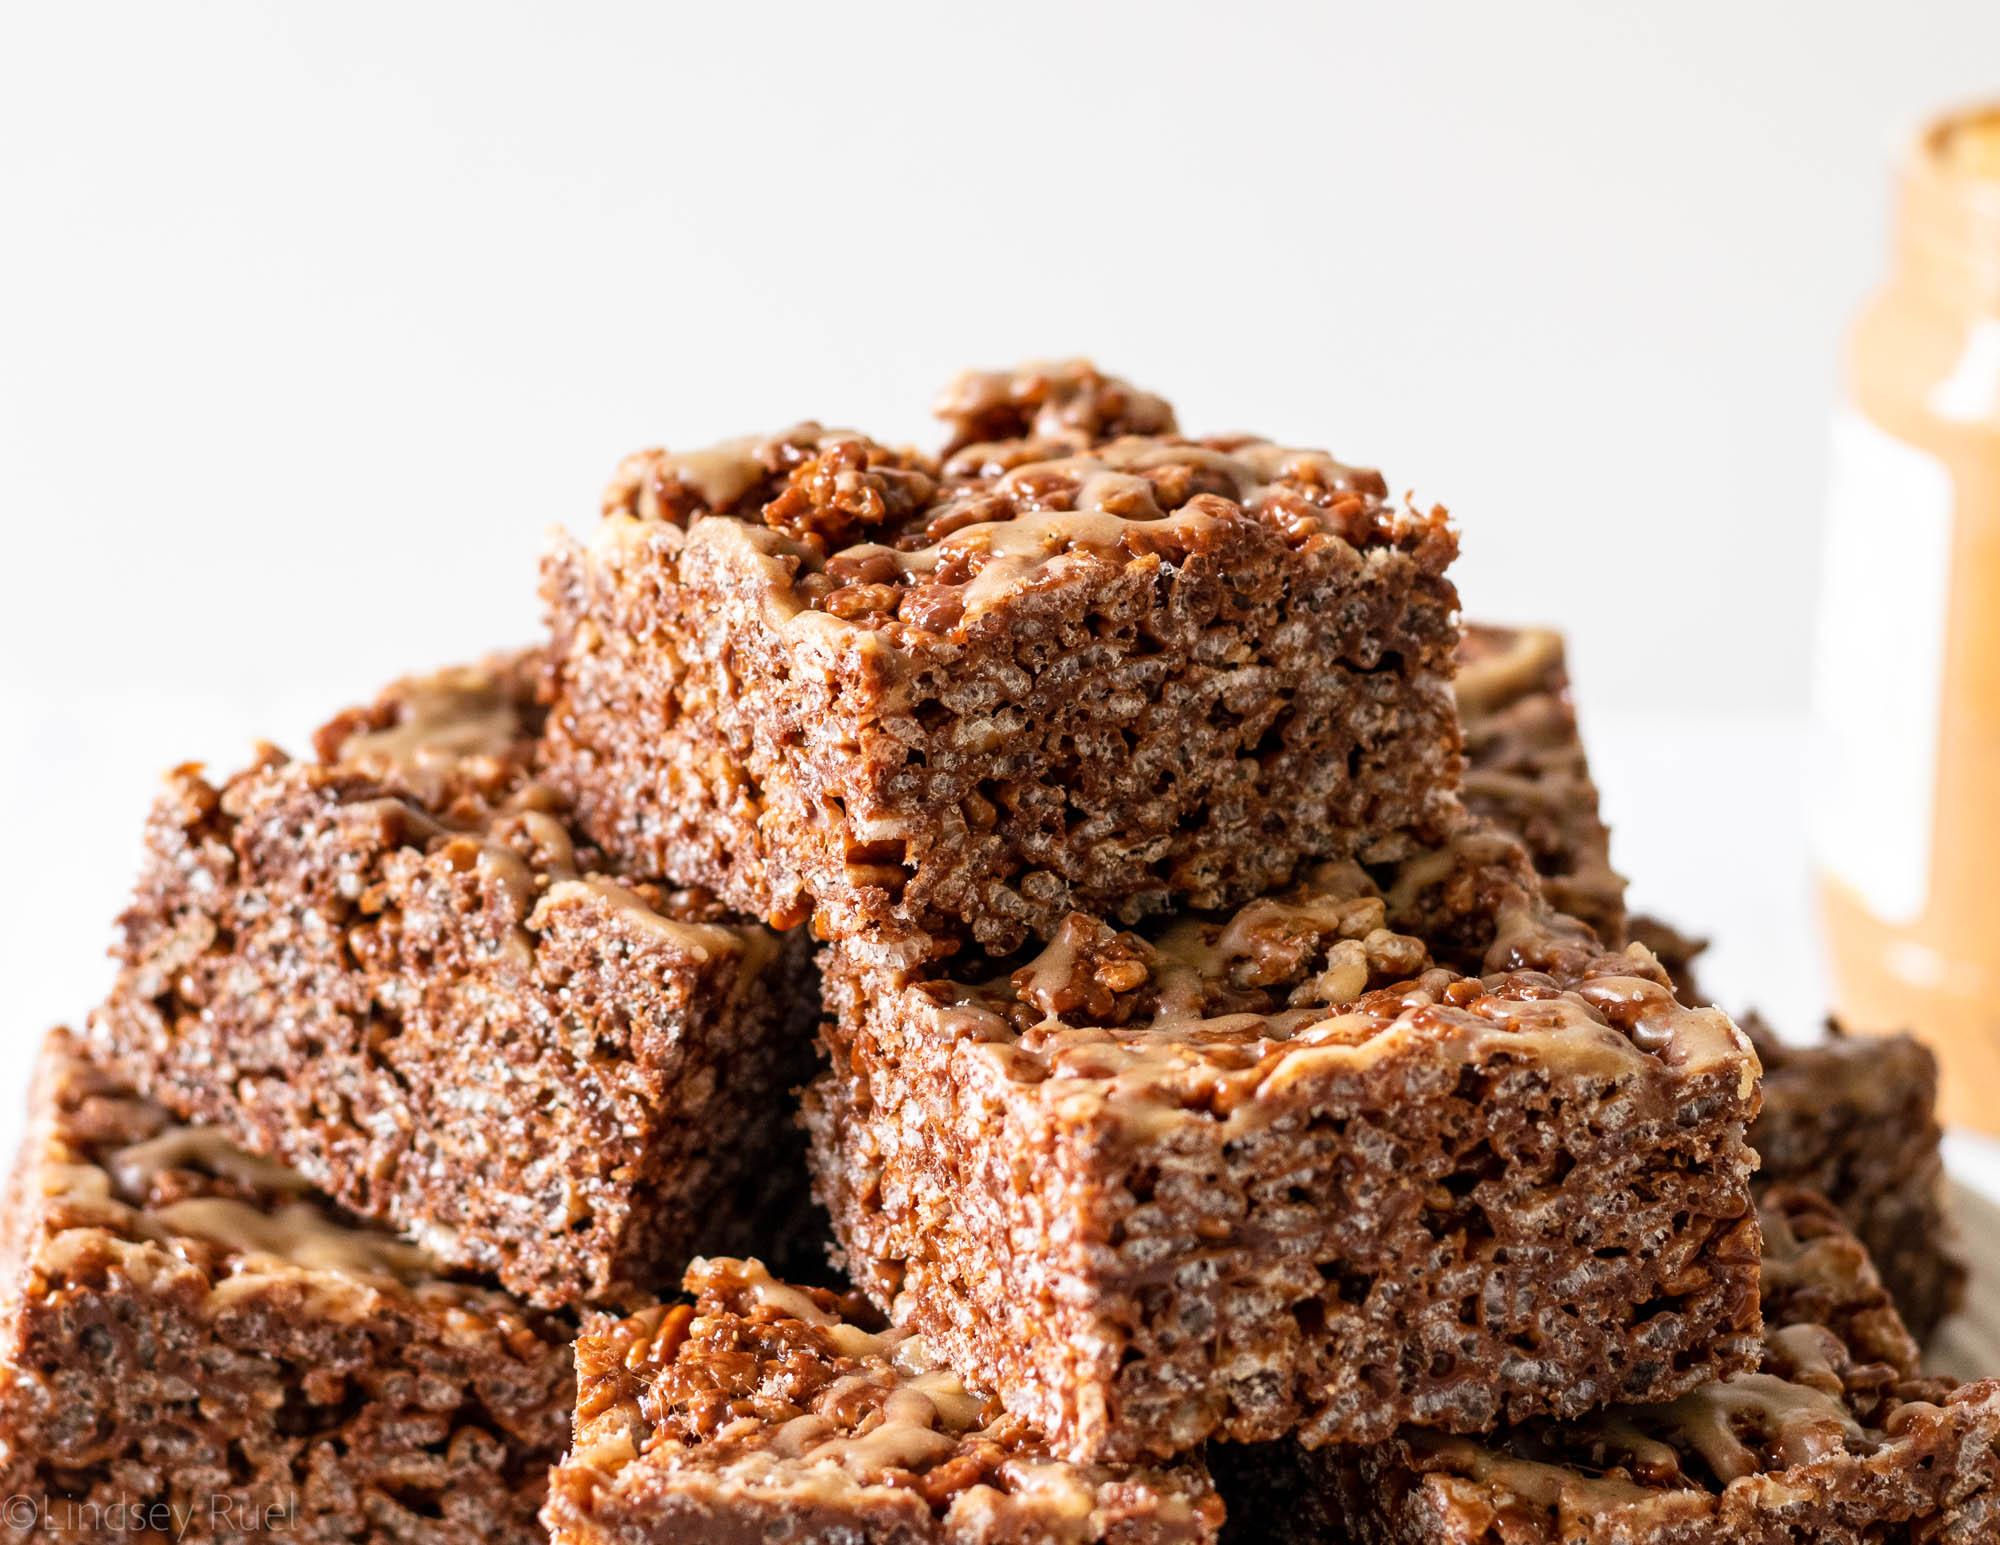 Peanut-Butter-Chocolate-Rice-Krispie-Treats-8.jpg